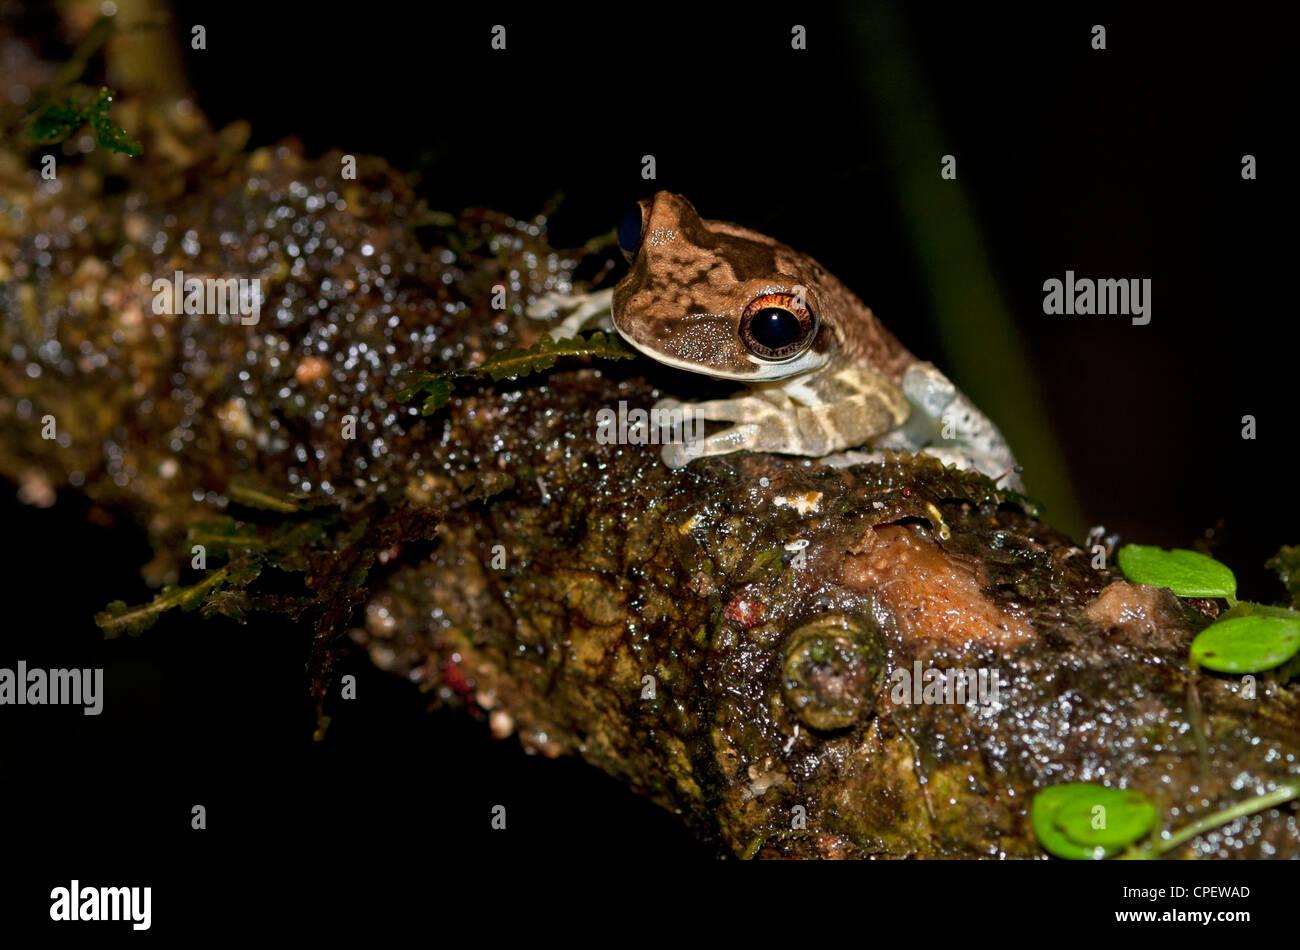 Osteocephalus sp., eine knöcherne - vorangegangen Treefrog, tiputini Regenwald, Yasuni Nationalpark, Ecuador Stockbild